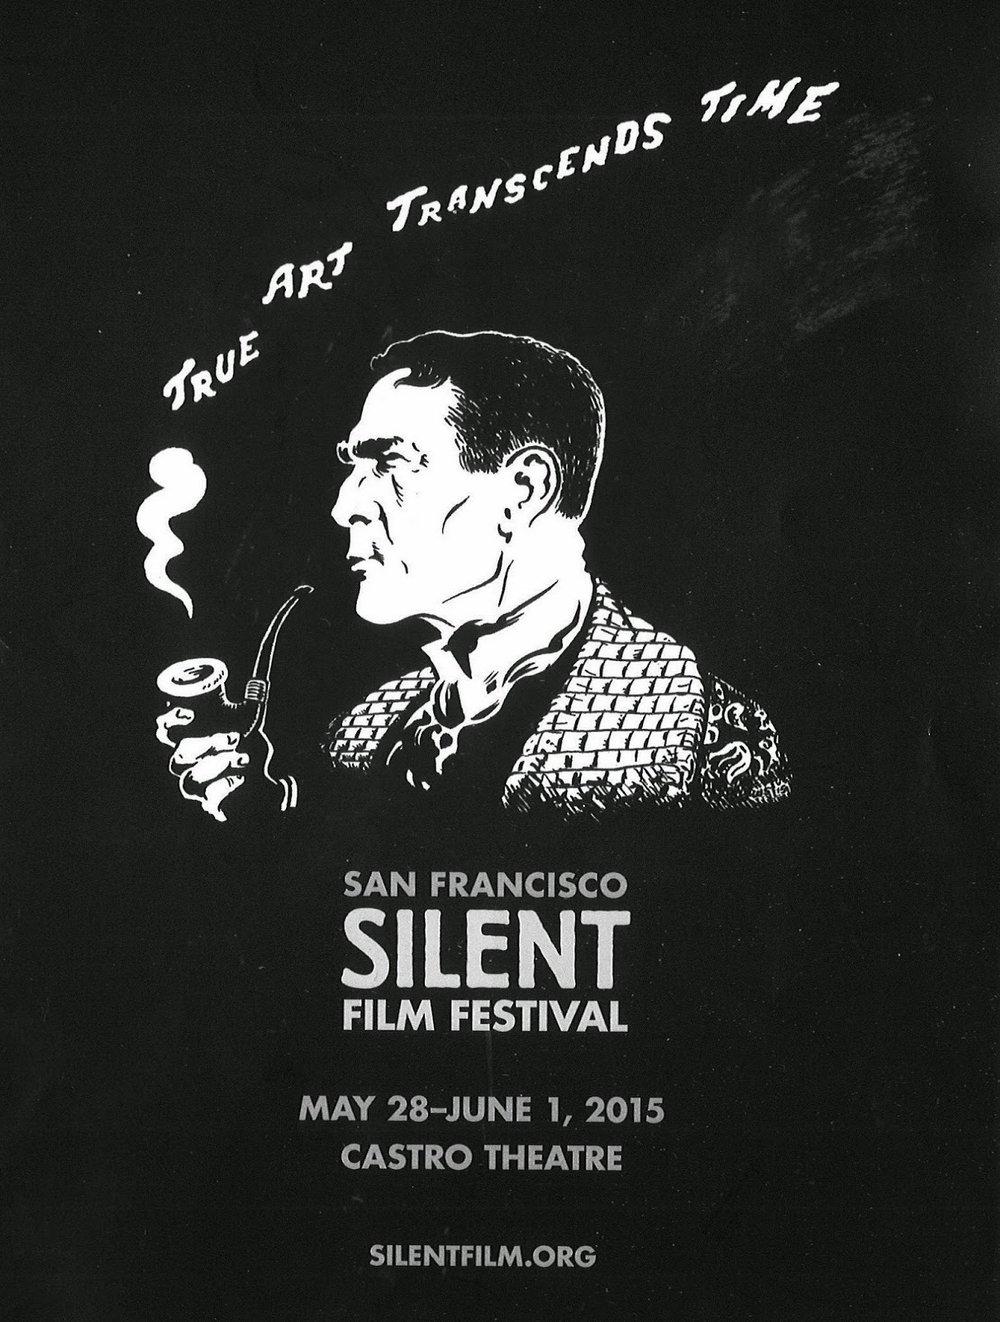 San Francisco Silent Film Festival Poster.jpeg